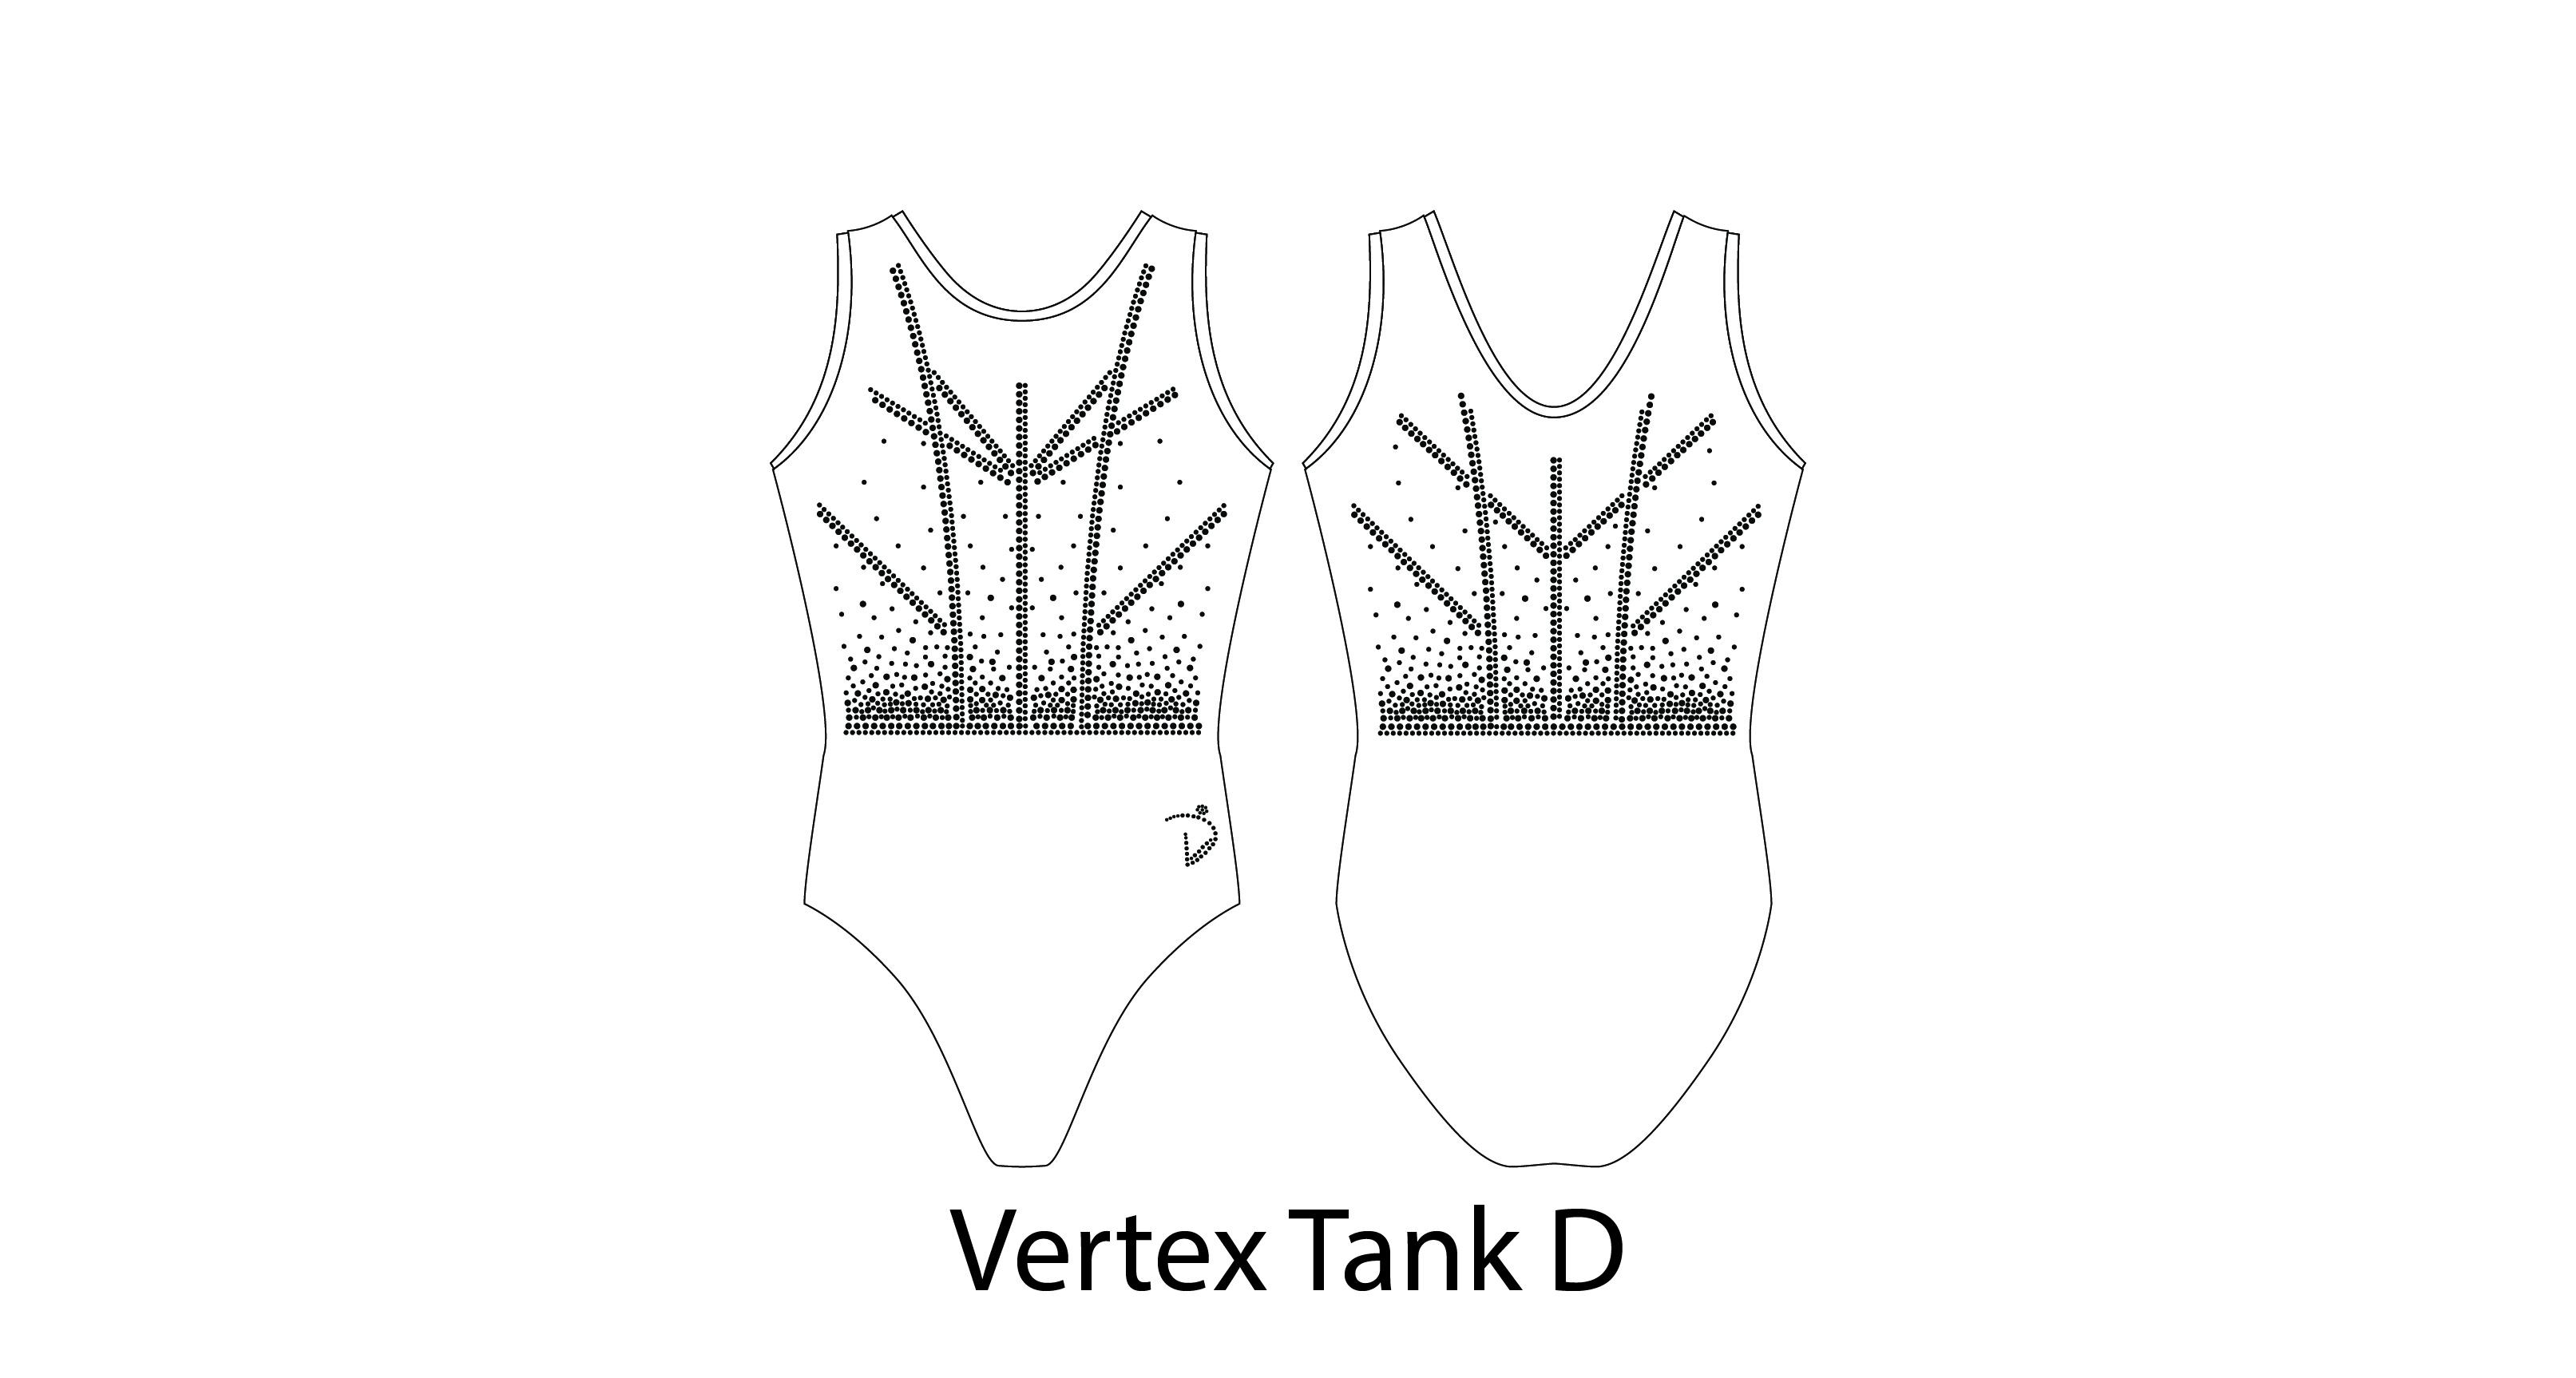 Vertex Tank D